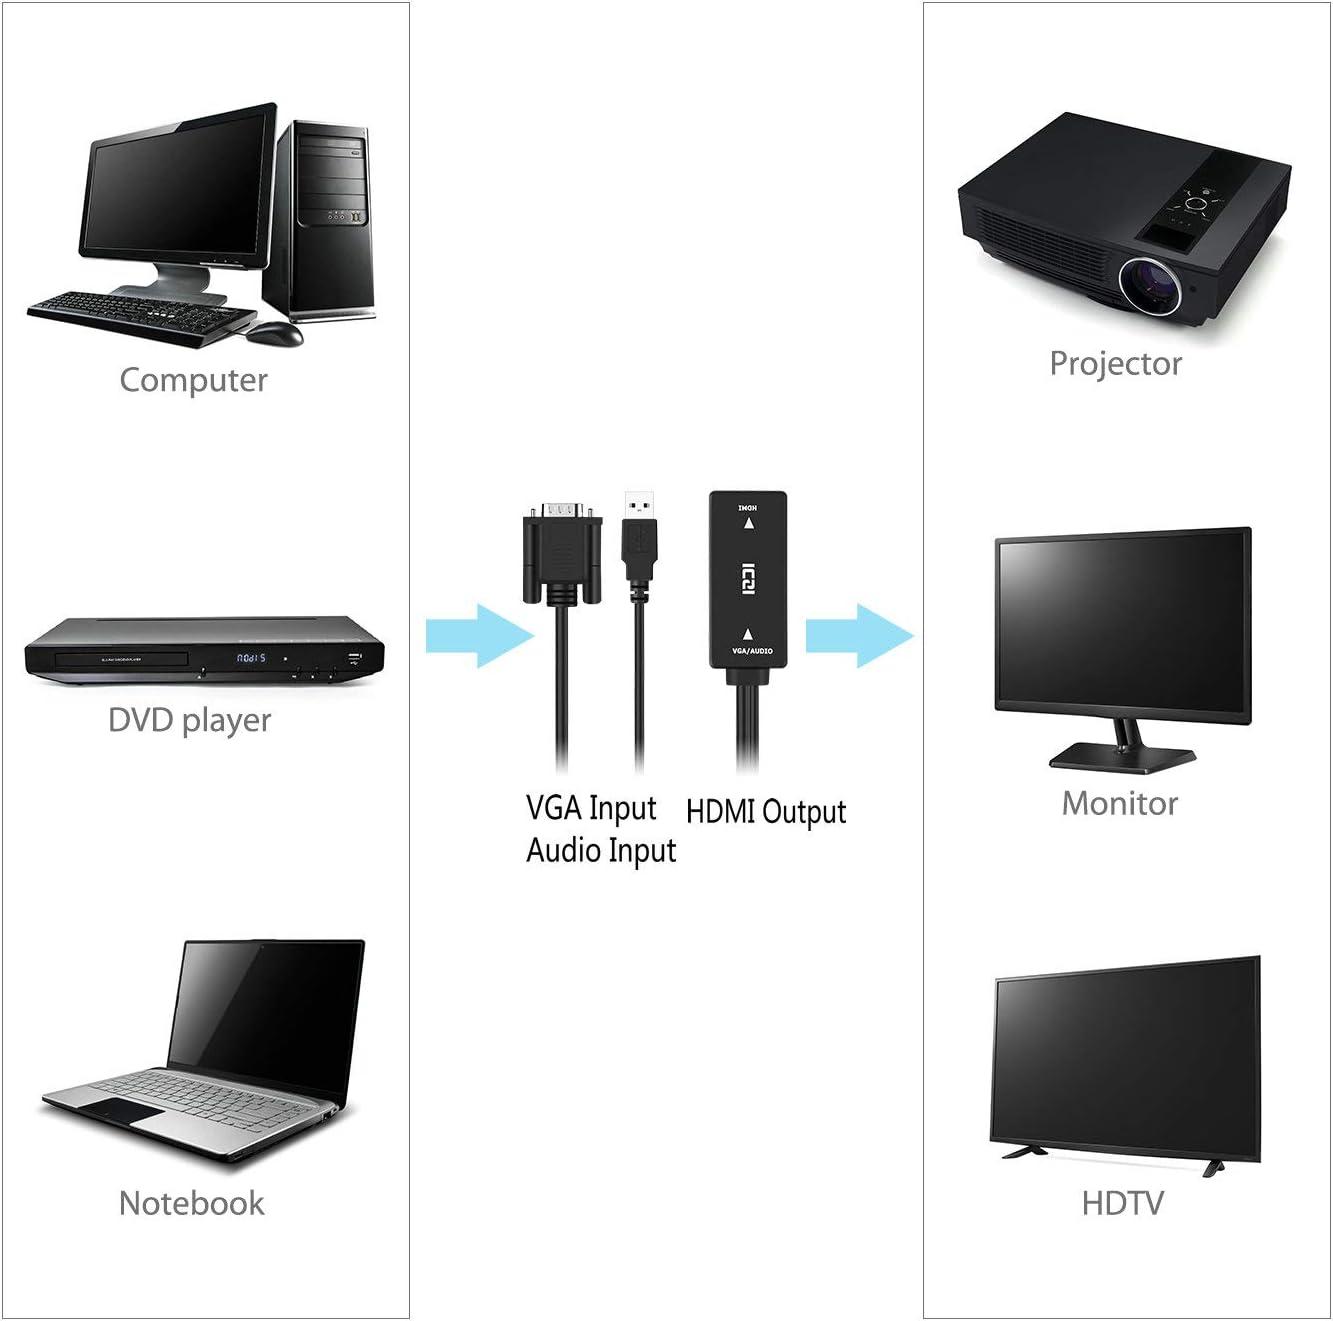 ICZI Adaptador conversor VGA a HDMI con audio (macho a hembra, 1080p) con puertos USB para conectar PC, computadora portátil al proyector, HDTV, pantalla y monitor Negro: Amazon.es: Electrónica